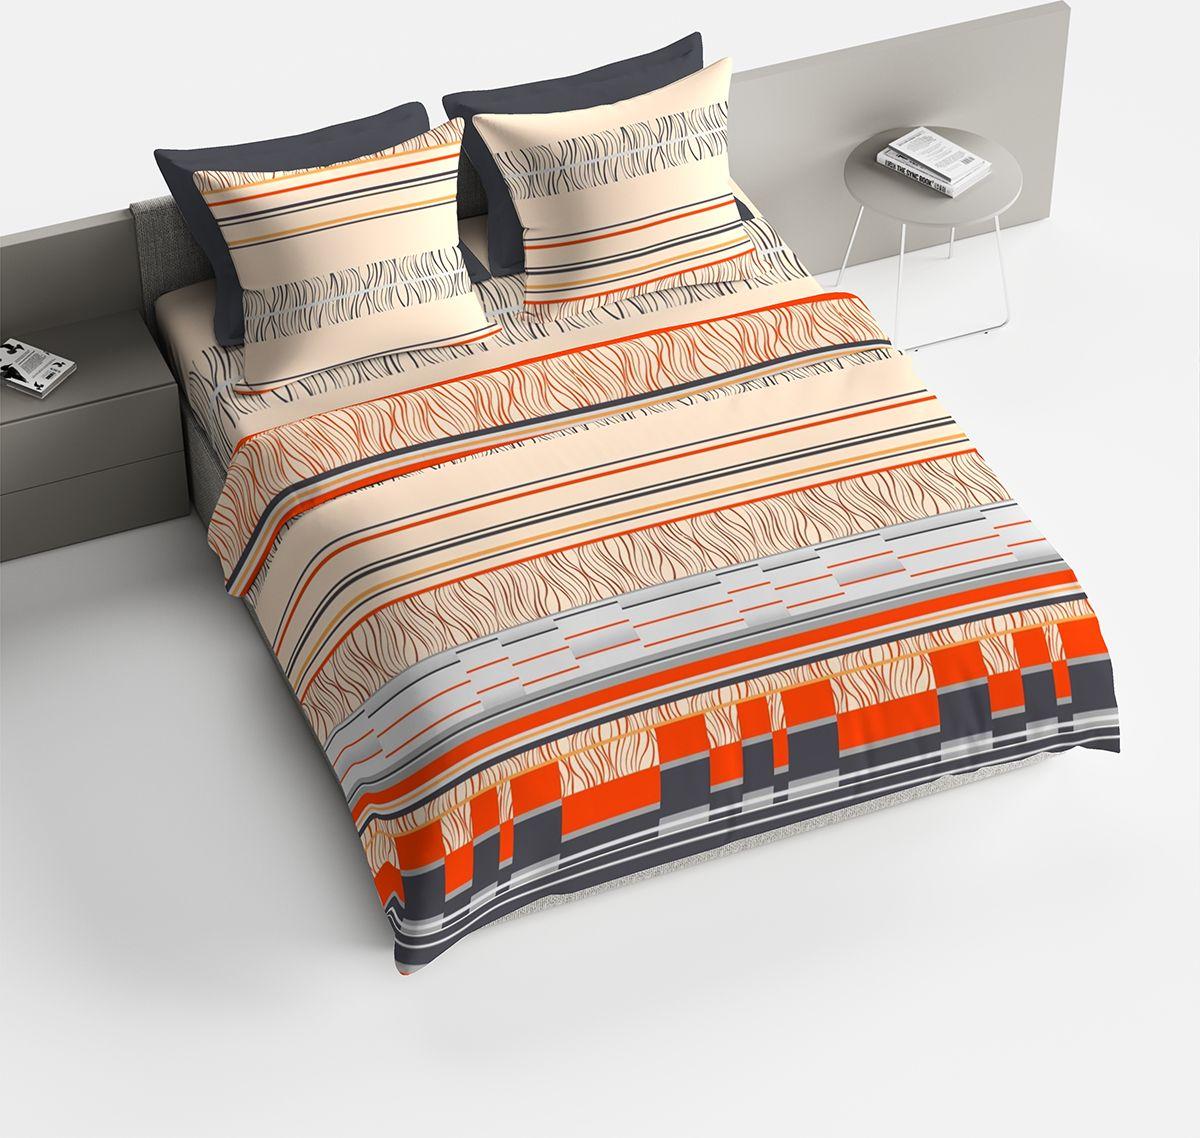 Комплект белья Браво Манфредо, 2-х спальное, наволочки 70x70, цвет: оранжевый. 4075-187741